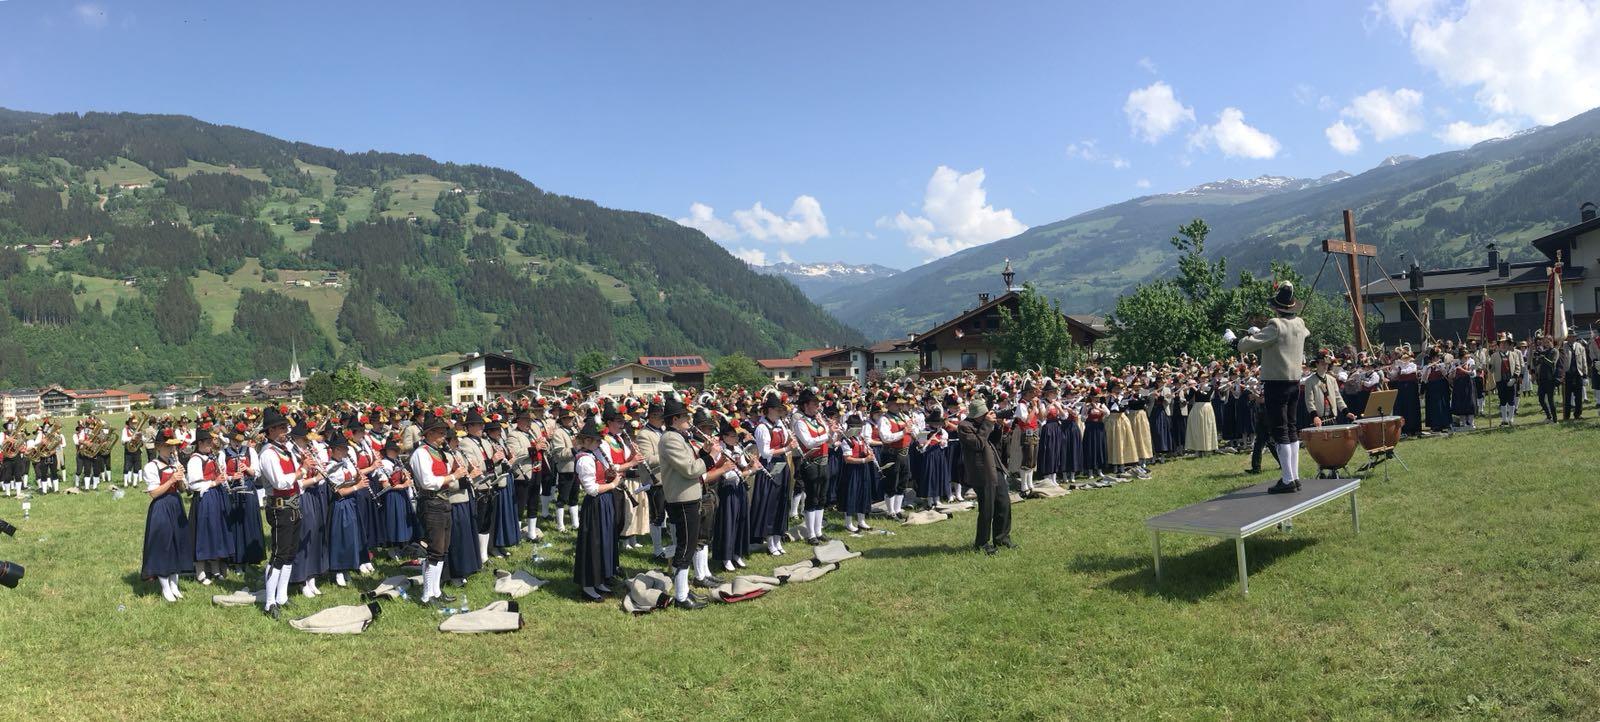 2018-05-06 Bezirksmusikfest (9)